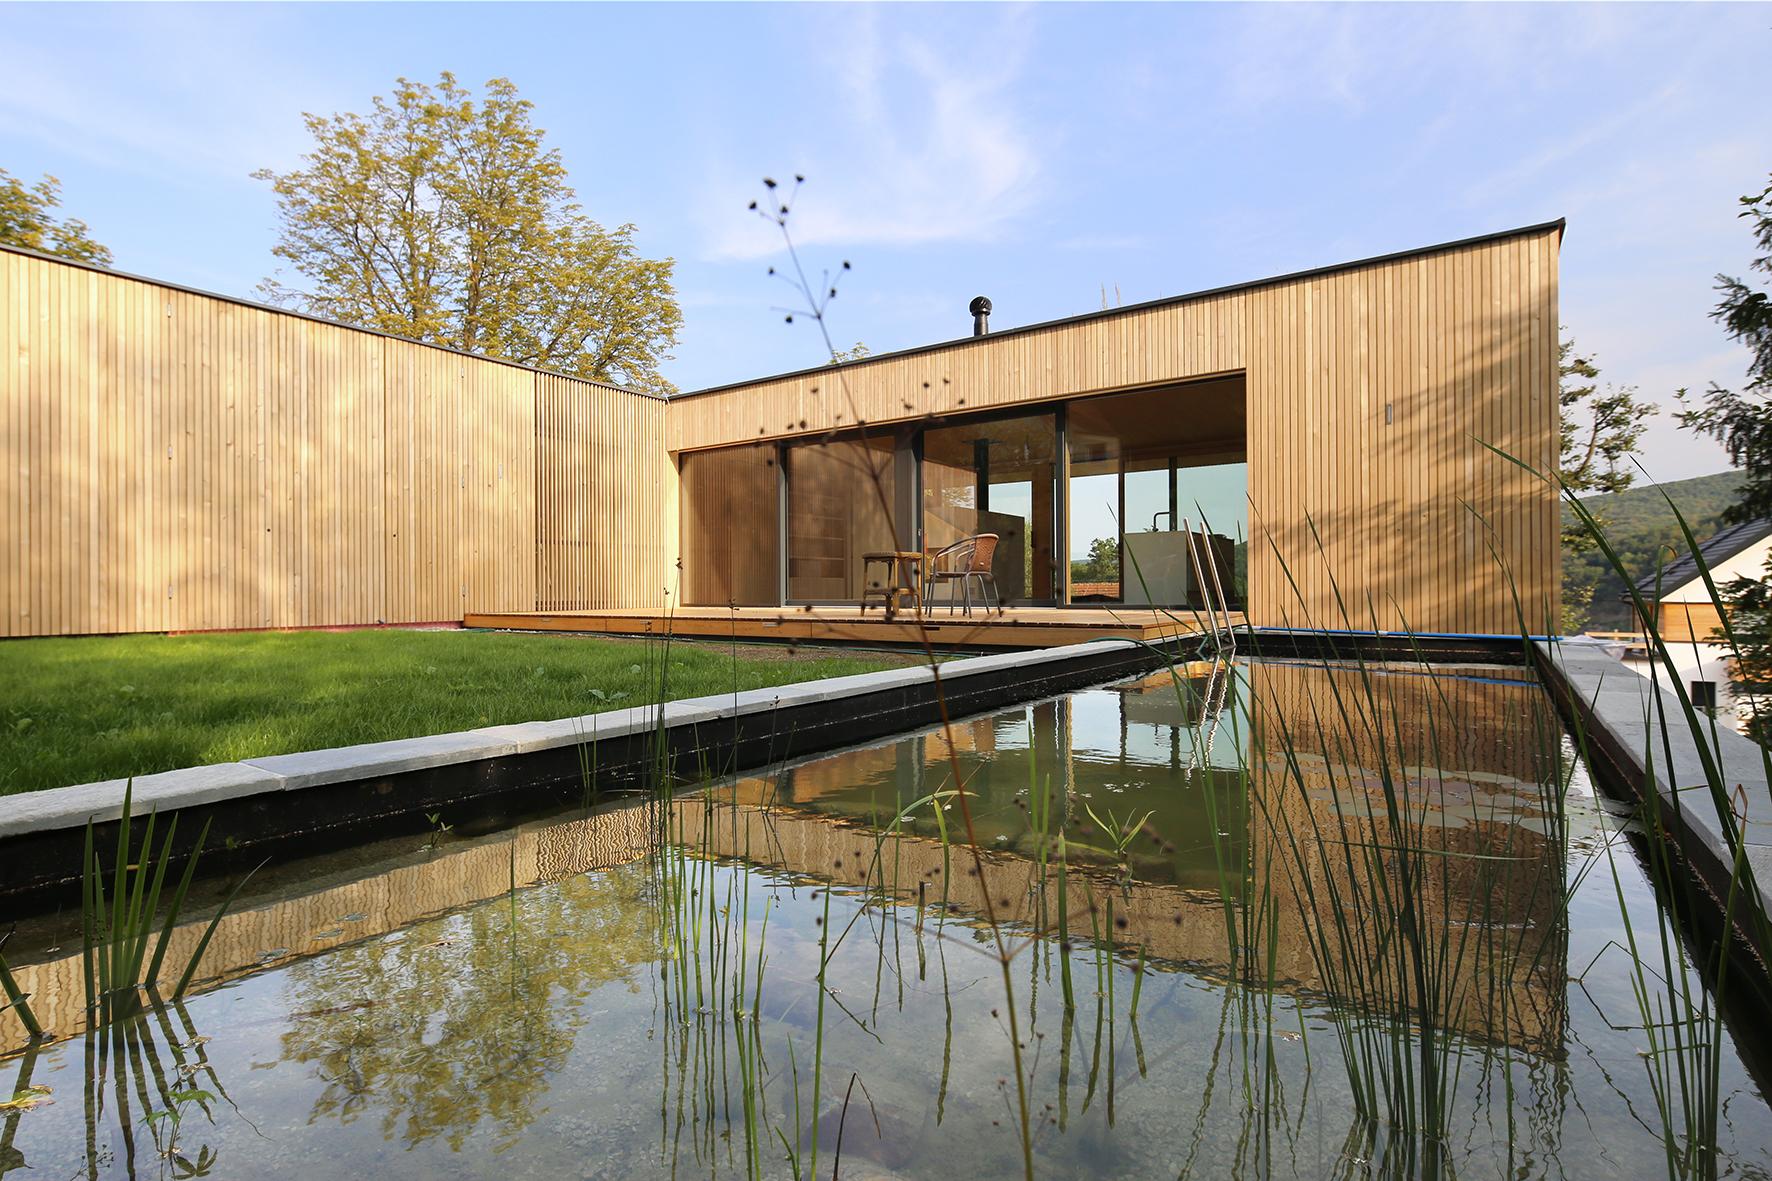 Das L-Haus in Purkersdorf wurde teilweise mit recyceltem Matereal erbaut / Foto: © Juri Troy